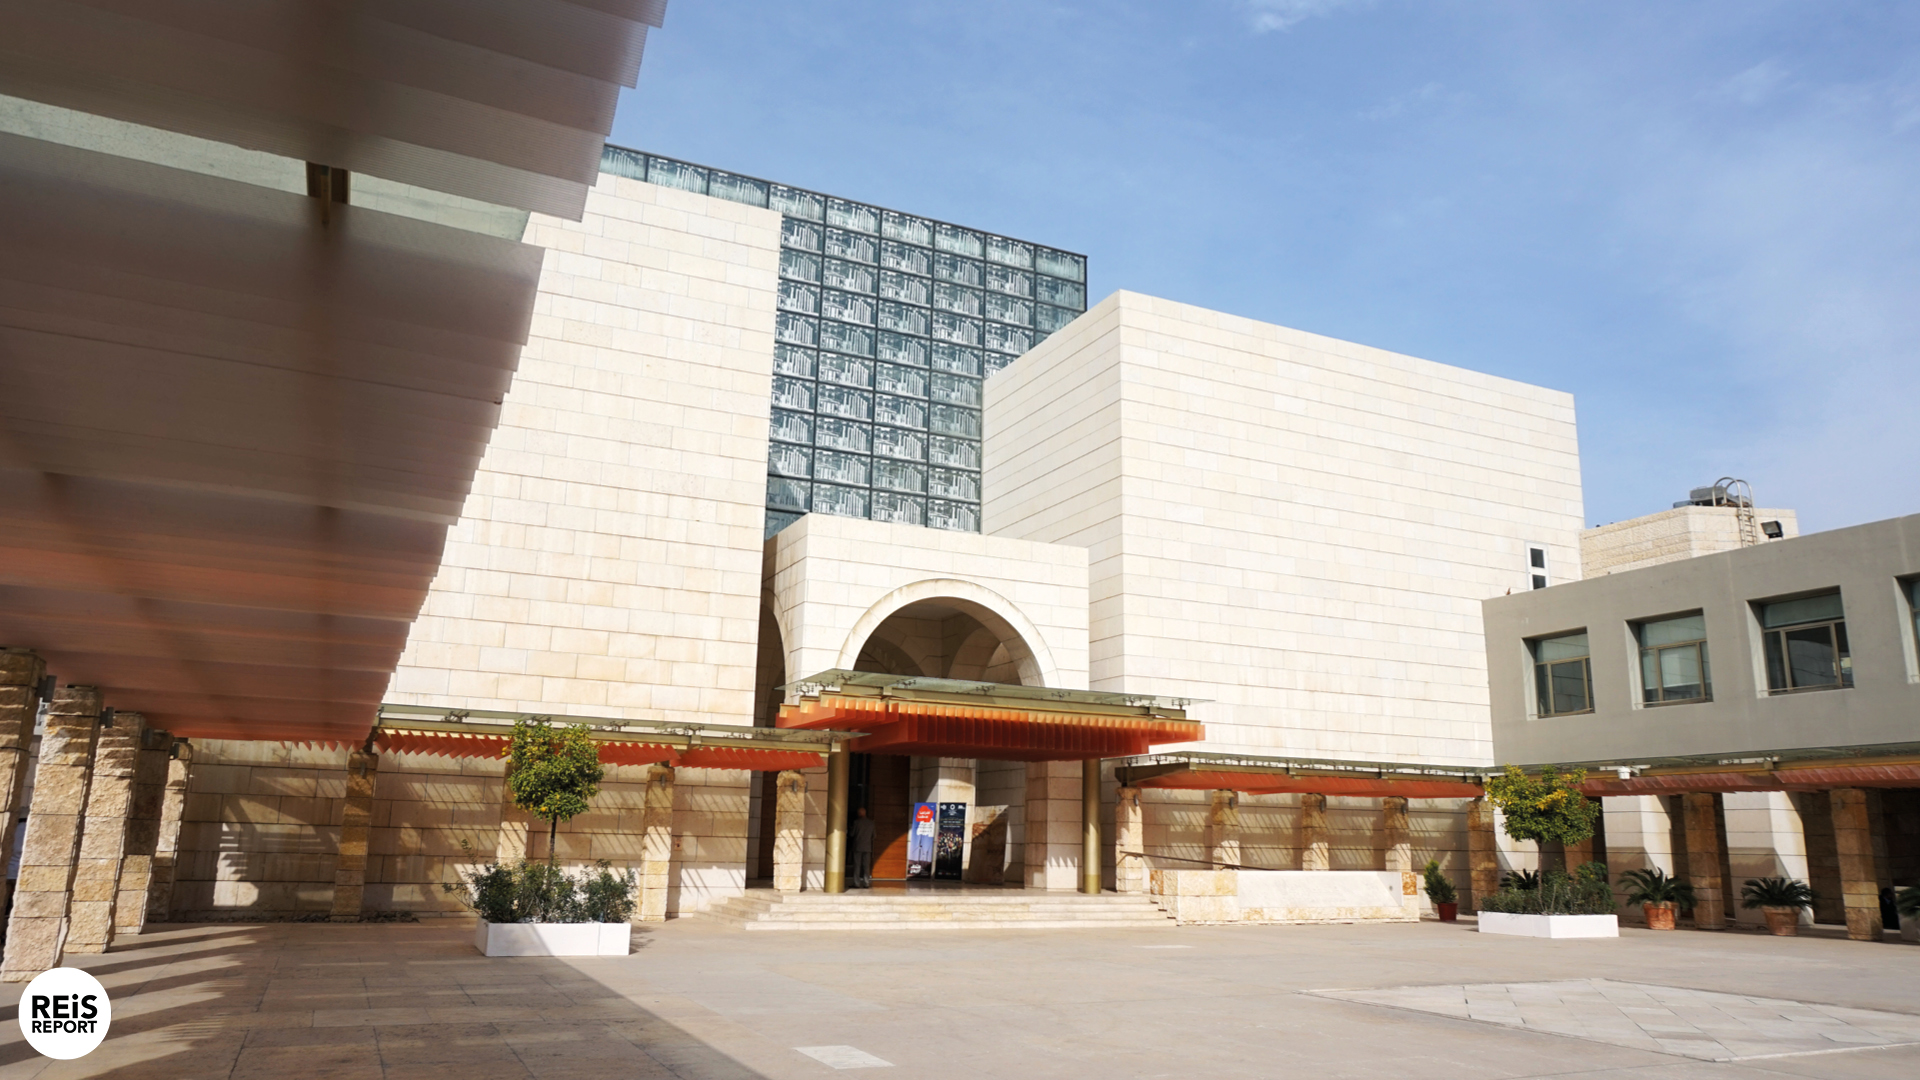 jordanie museum